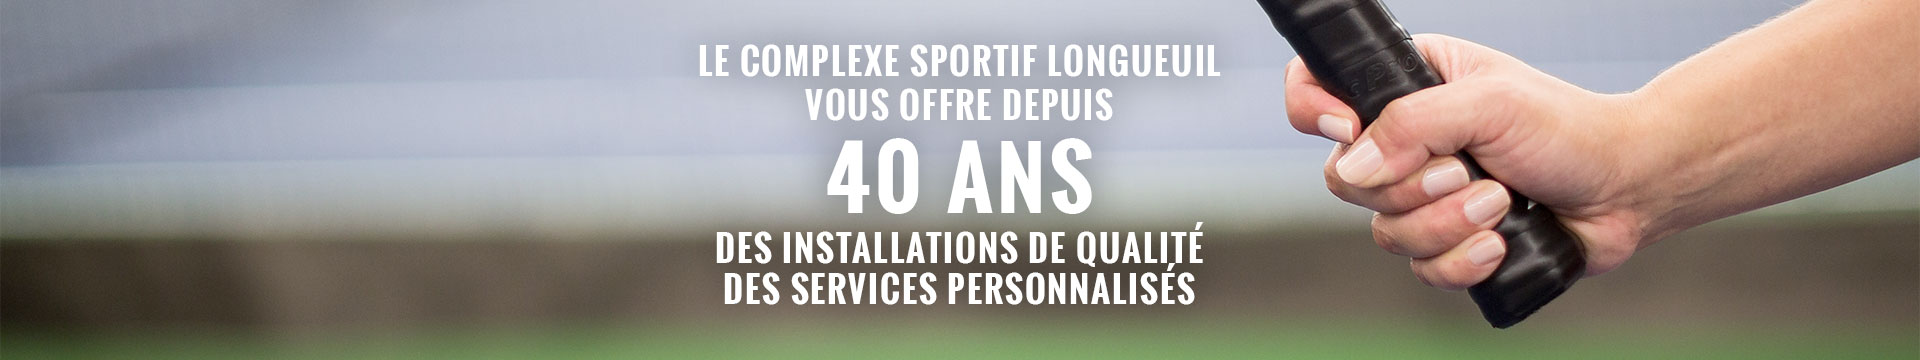 aréna du Complexe sportif Longueuil